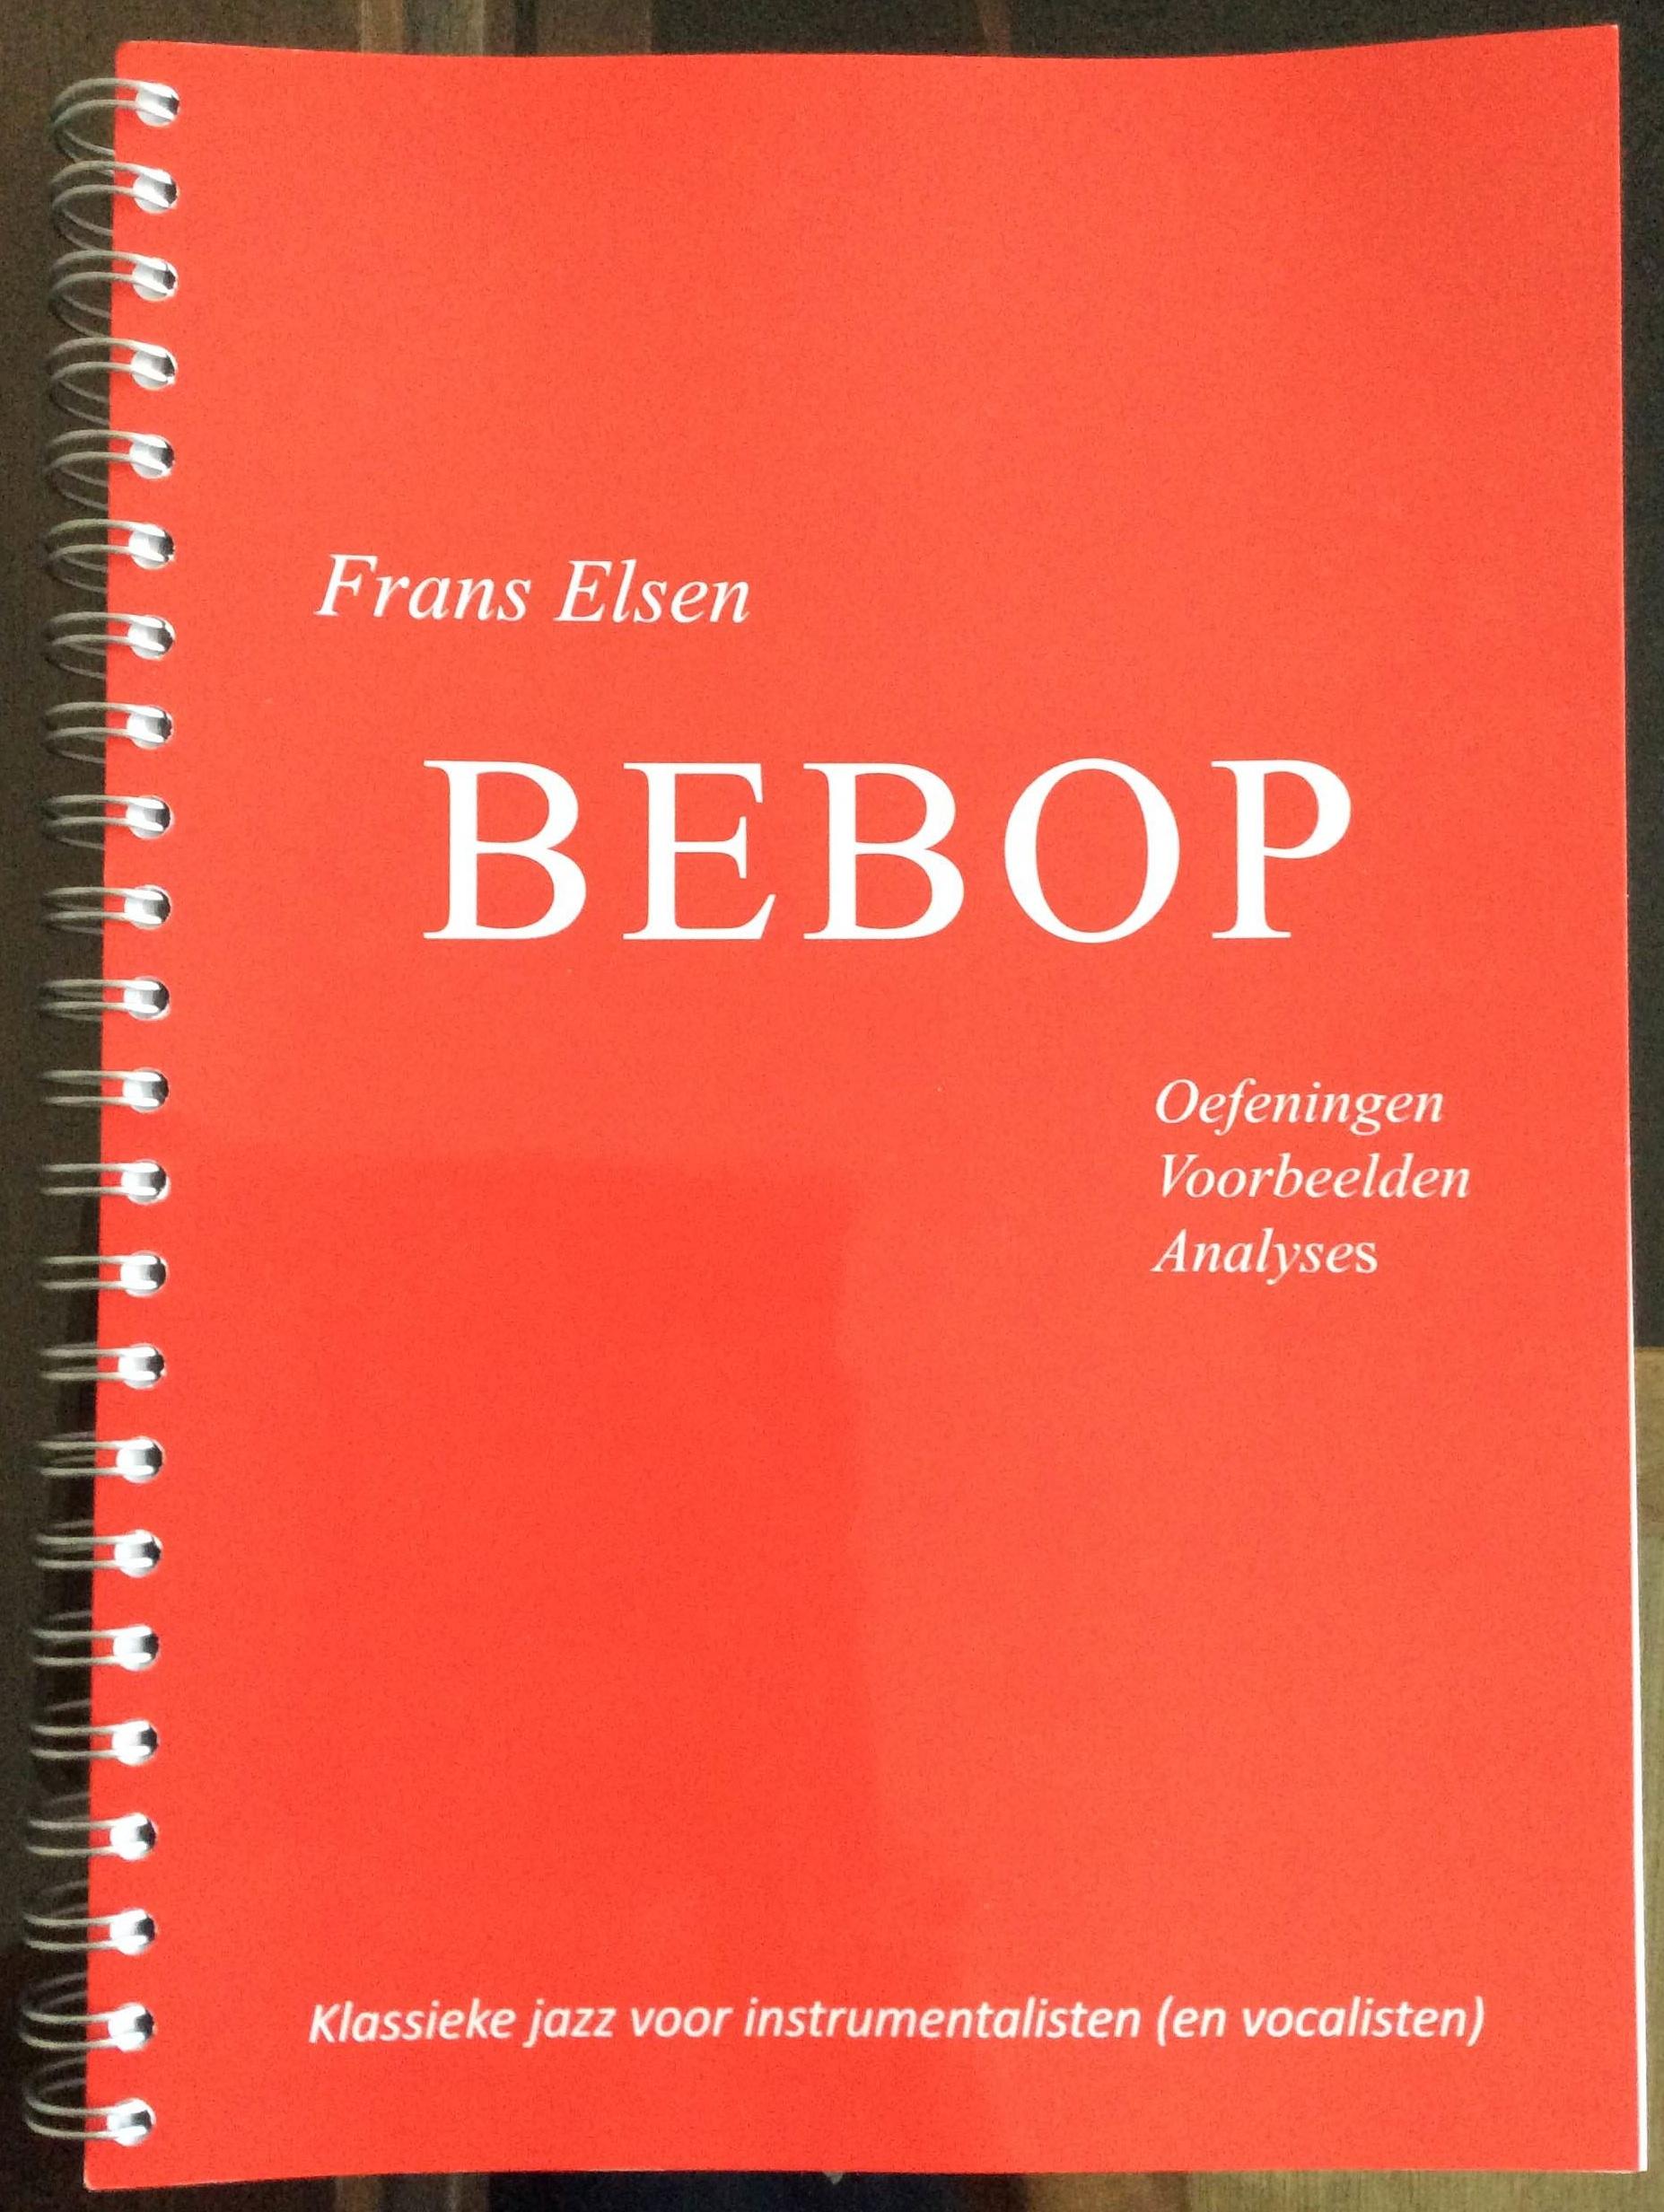 Foto bebop boek